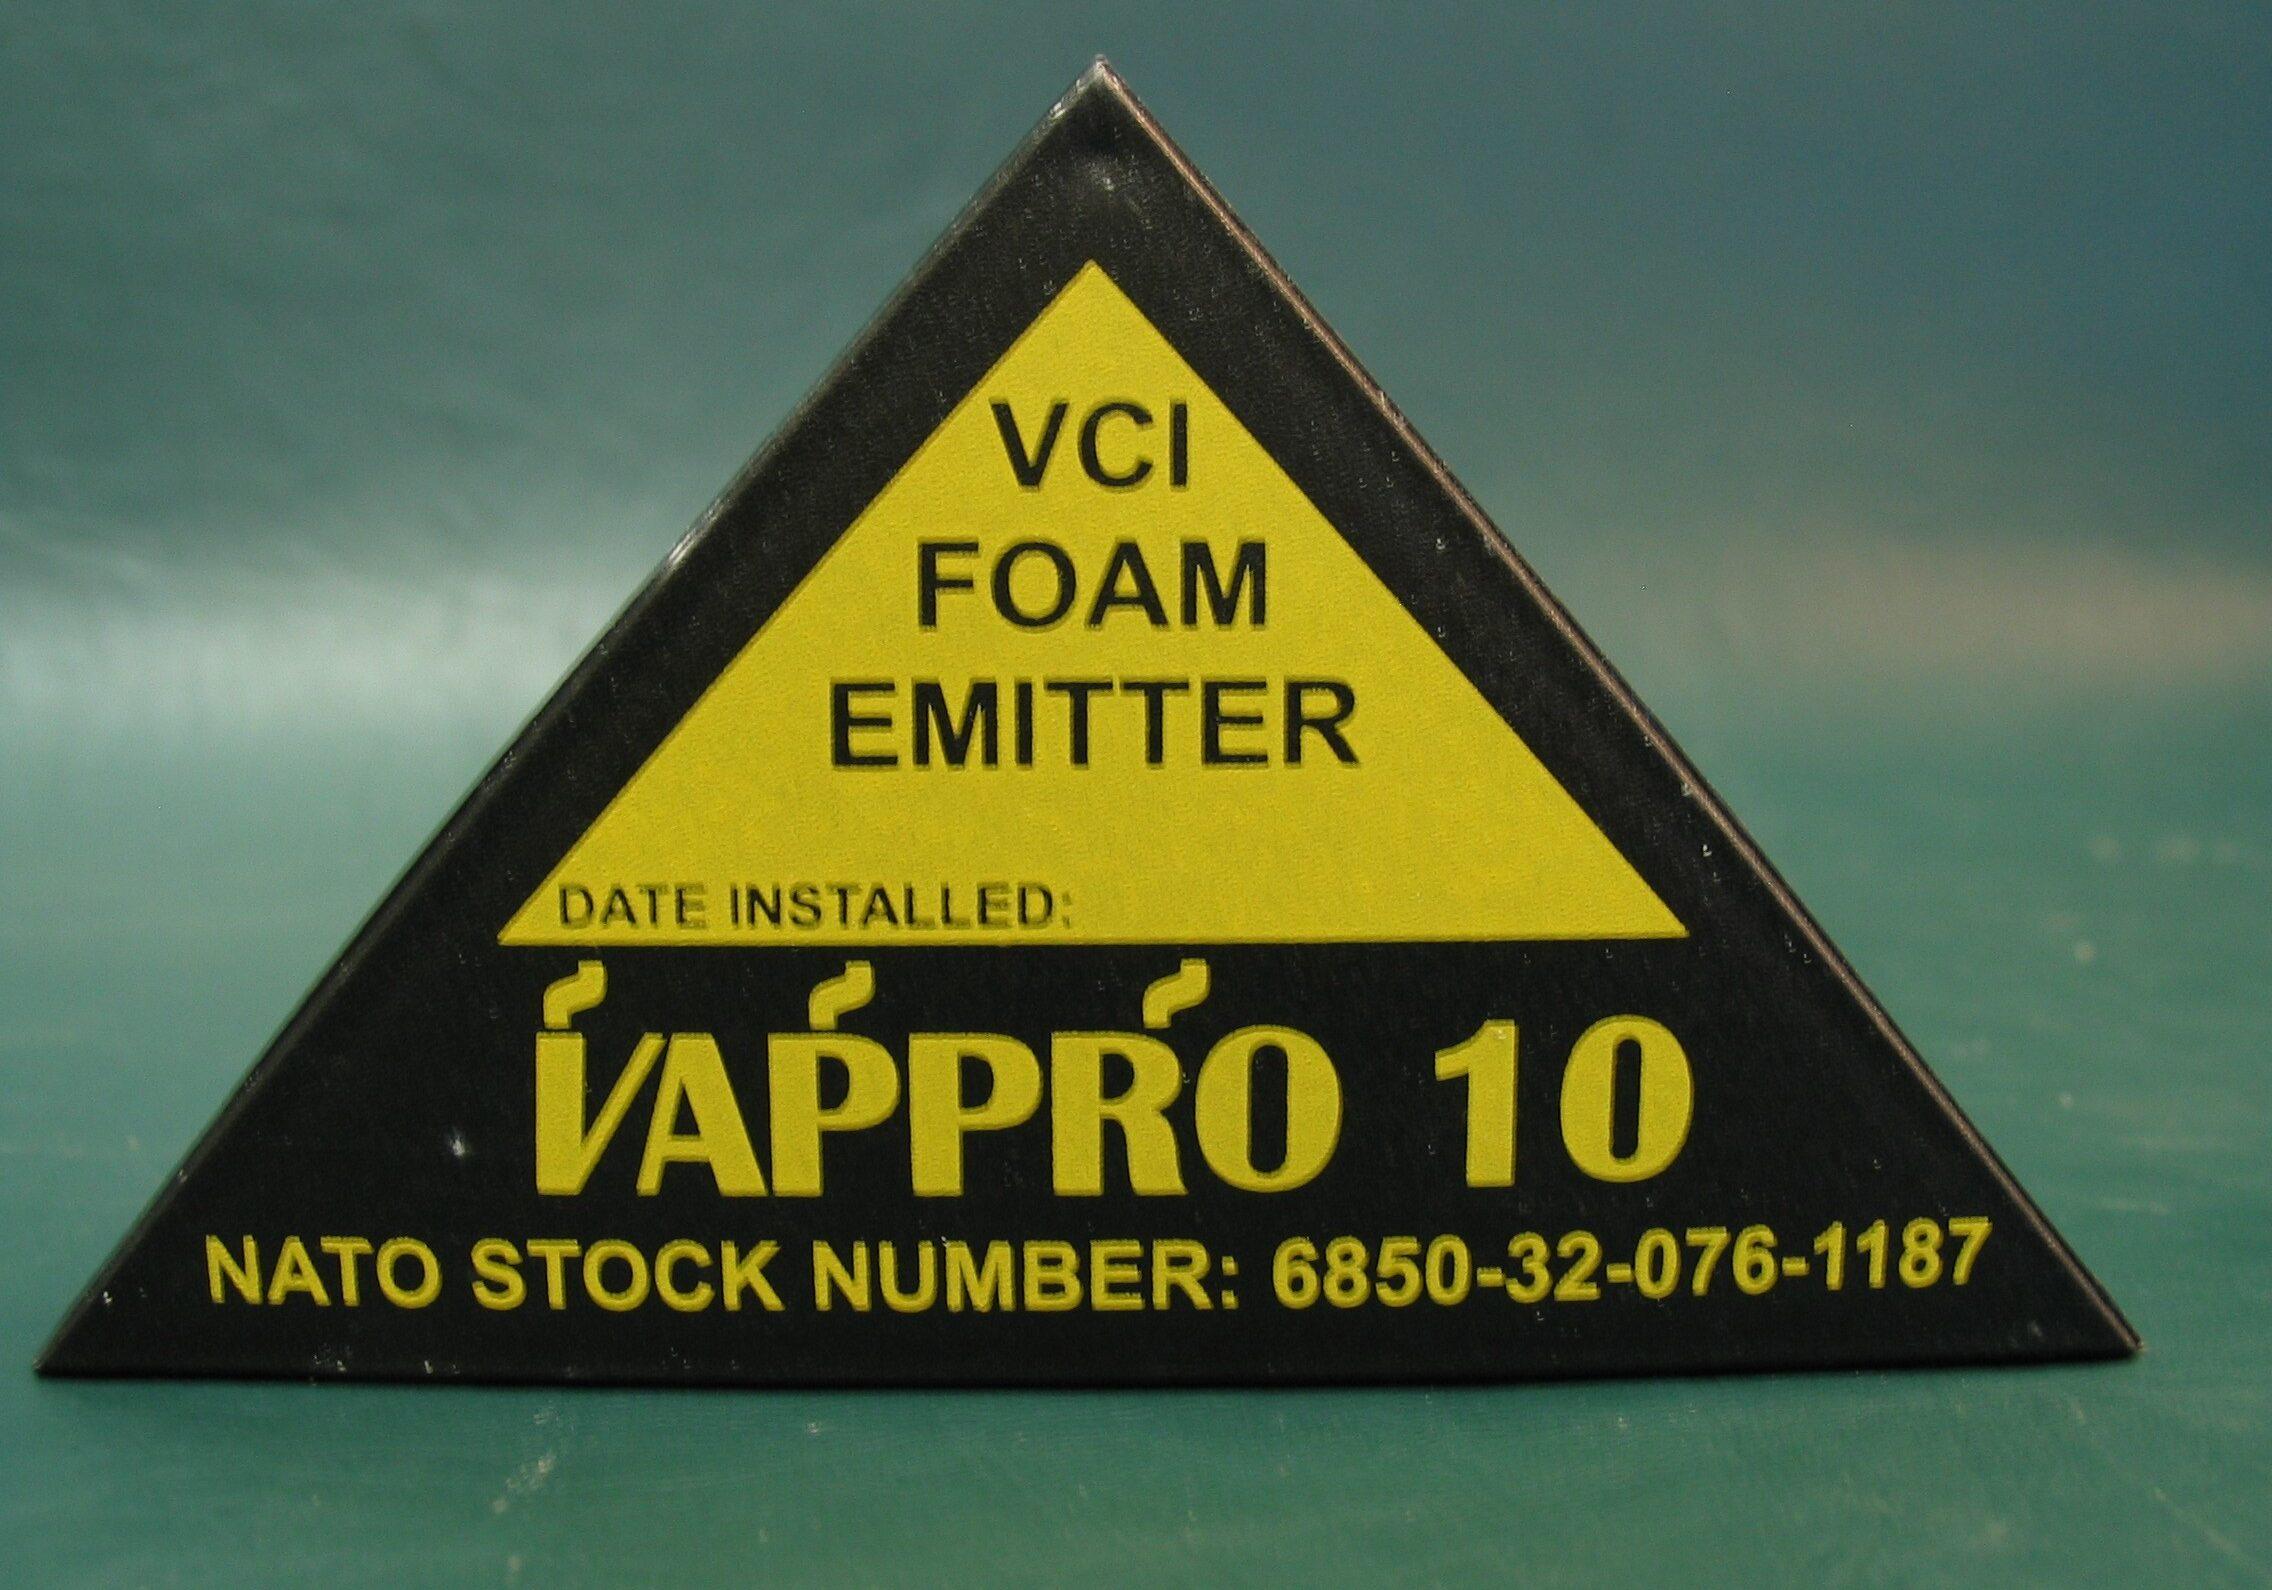 Vappro 10 VCI foam emitter